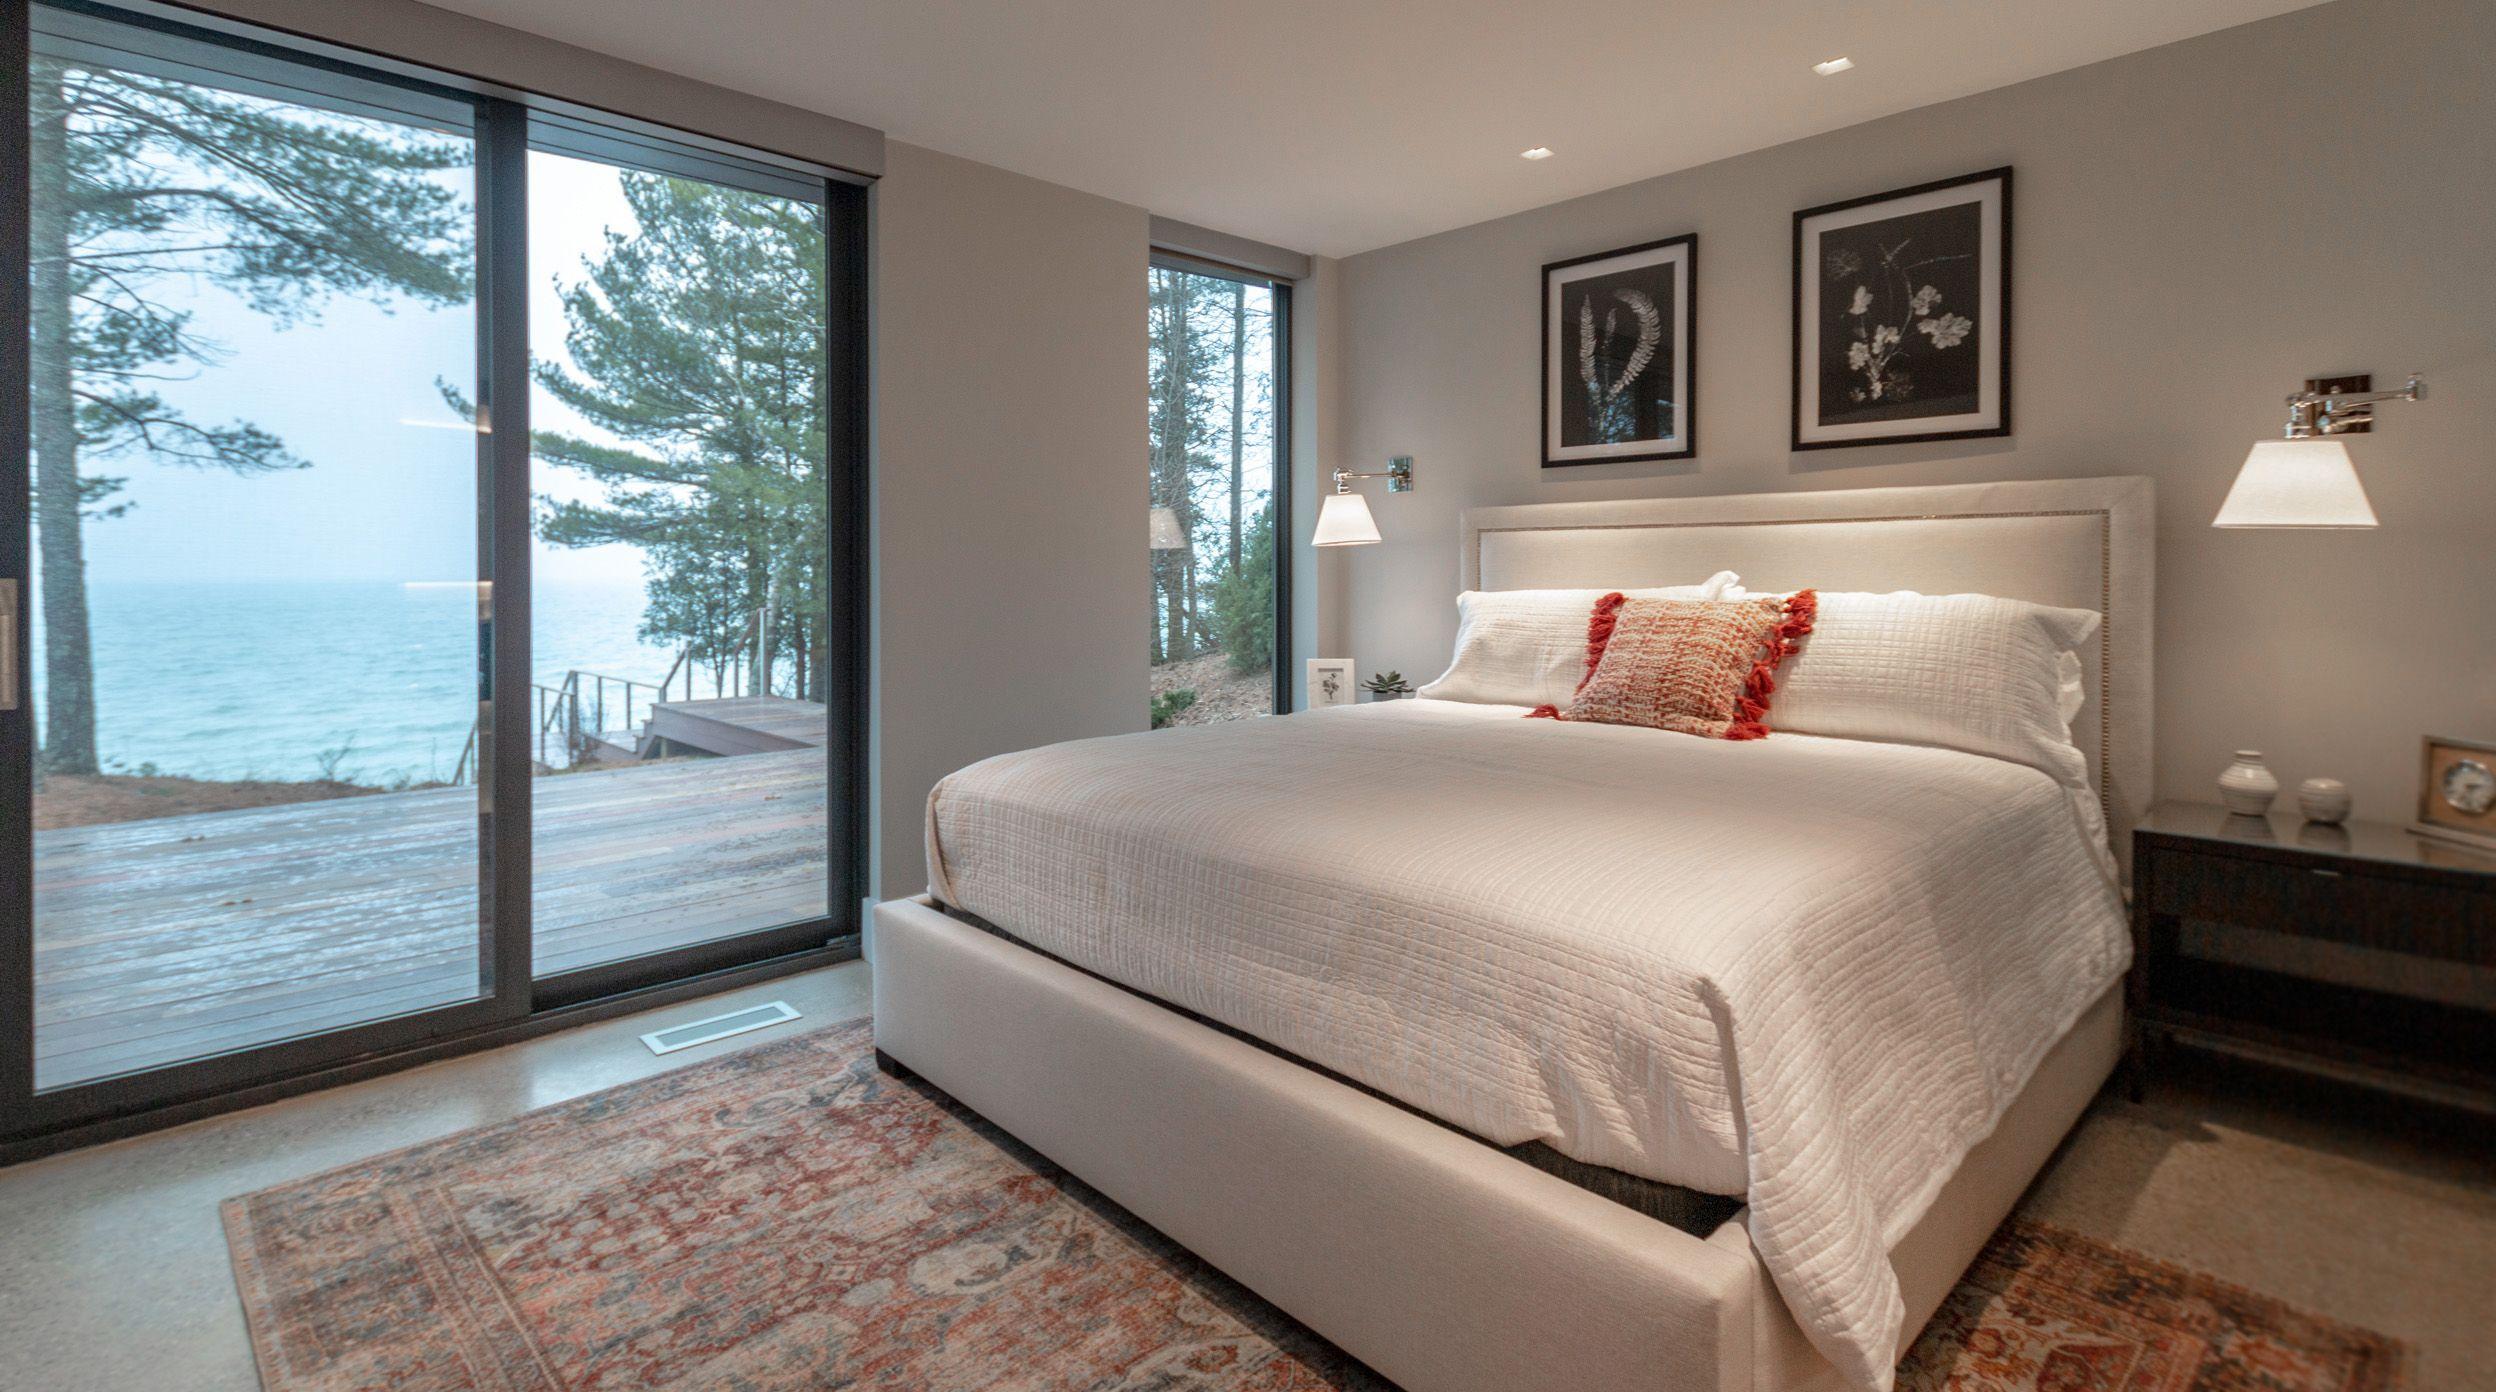 Bedroom design michigan cottage architecture and interior